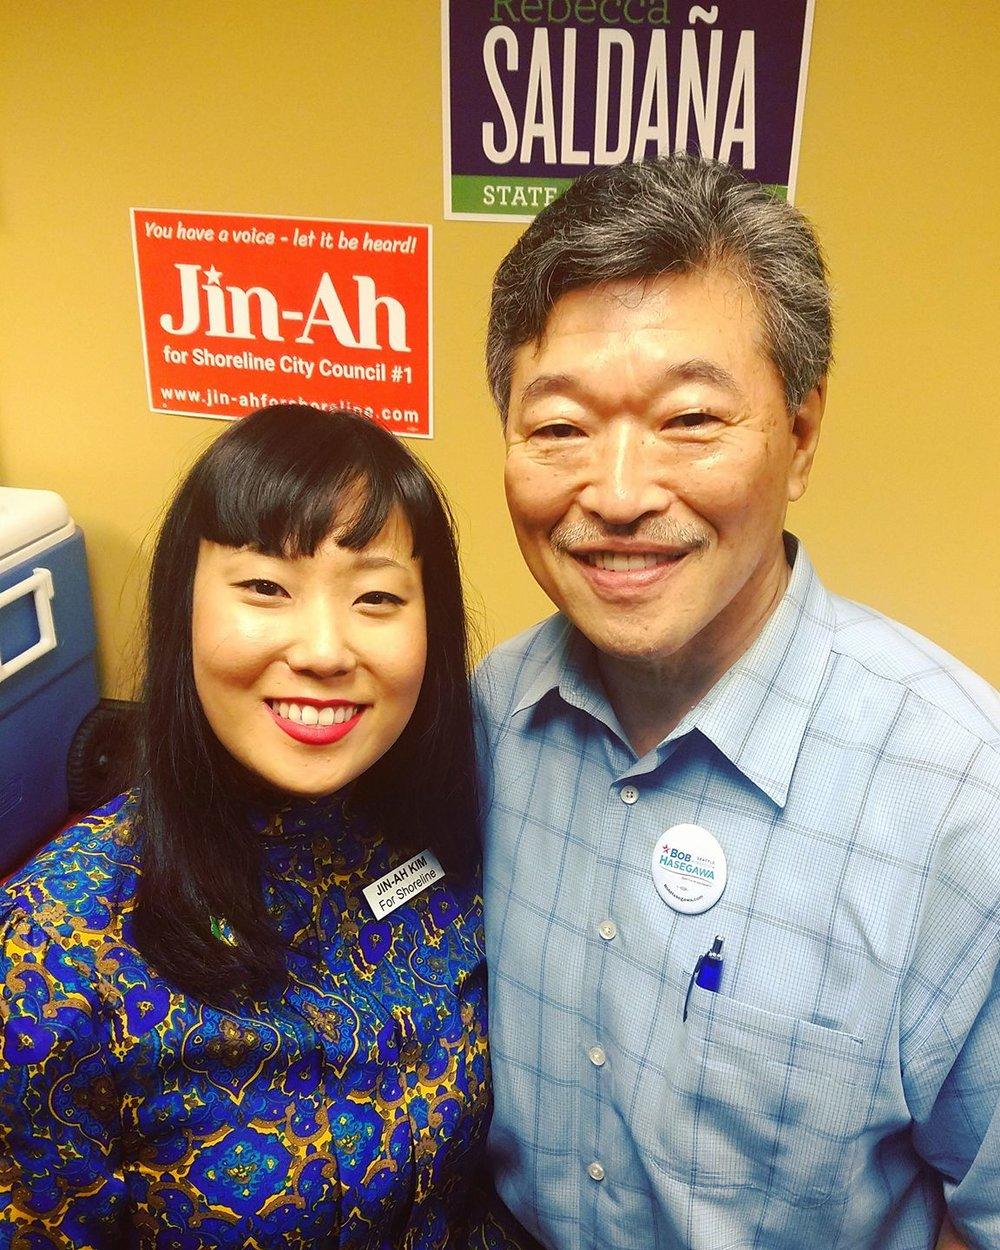 Proud to be endorsed by WA State Senator Bob Hasegawa - 11th Legislative District (Seattle)